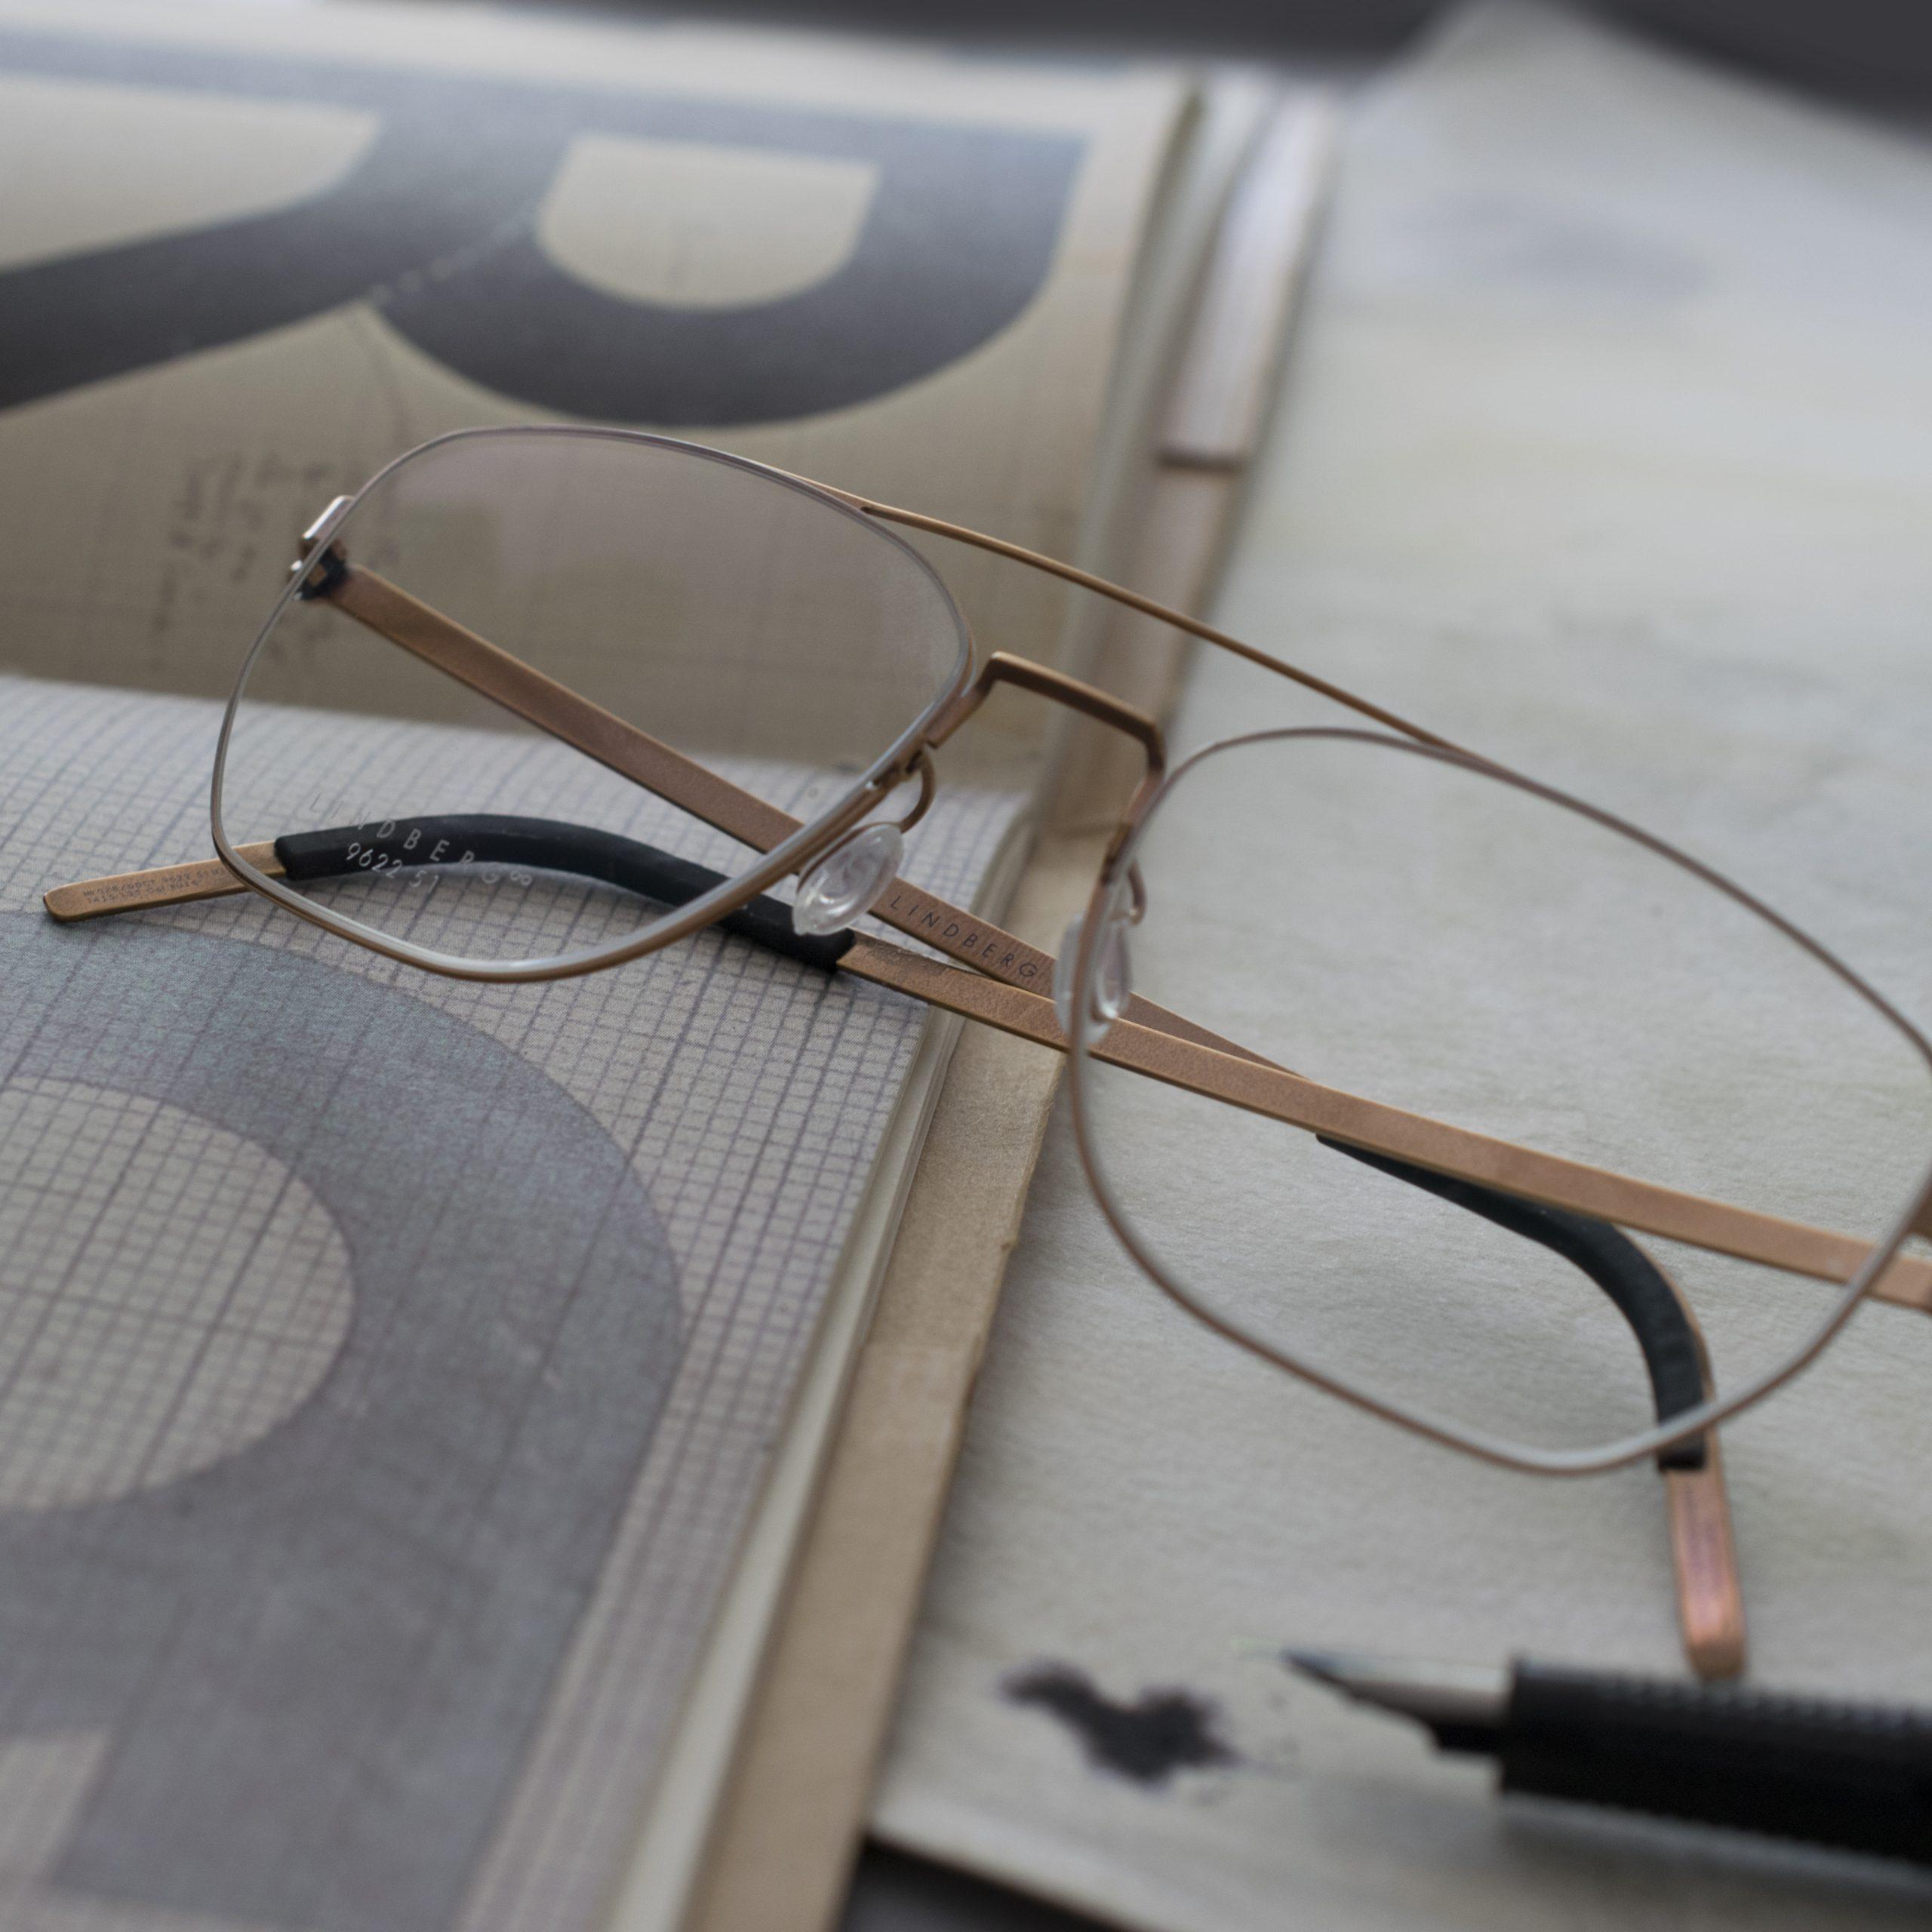 Opticians Vision Care Plan